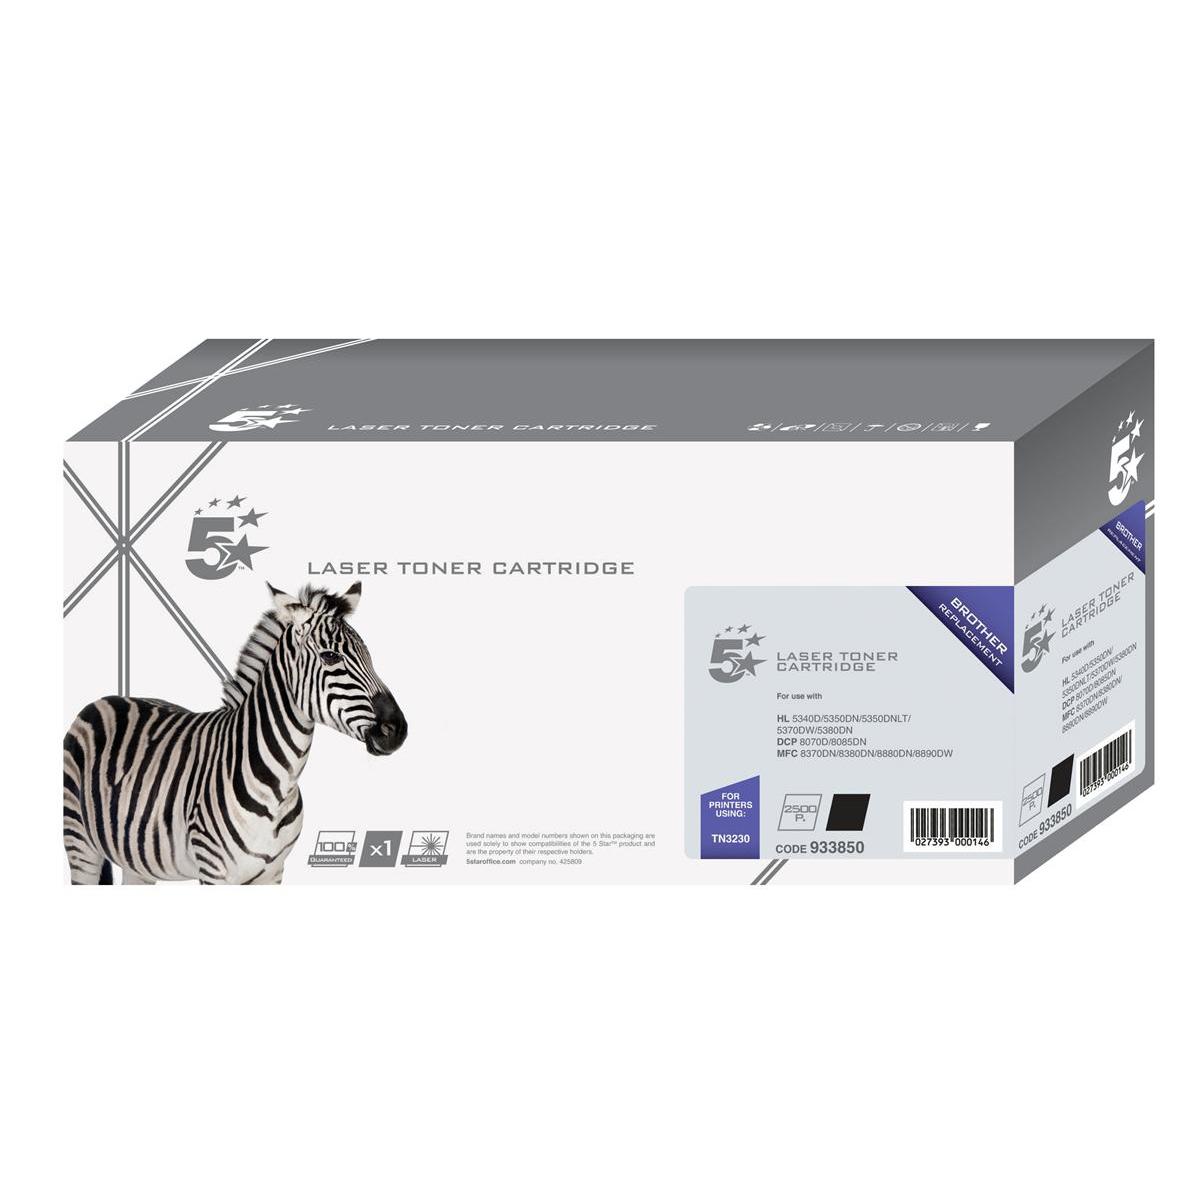 5 Star Office Remanufactured Laser Toner Cartridge Page Life 3000pp Black Brother TN3230 Alternative